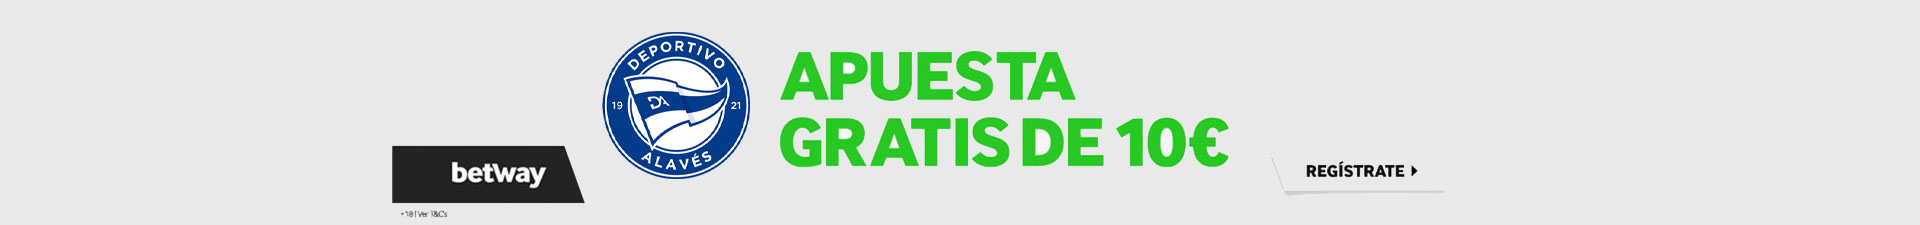 Deportivo Alaves Web Oficial Alaves Web Oficial